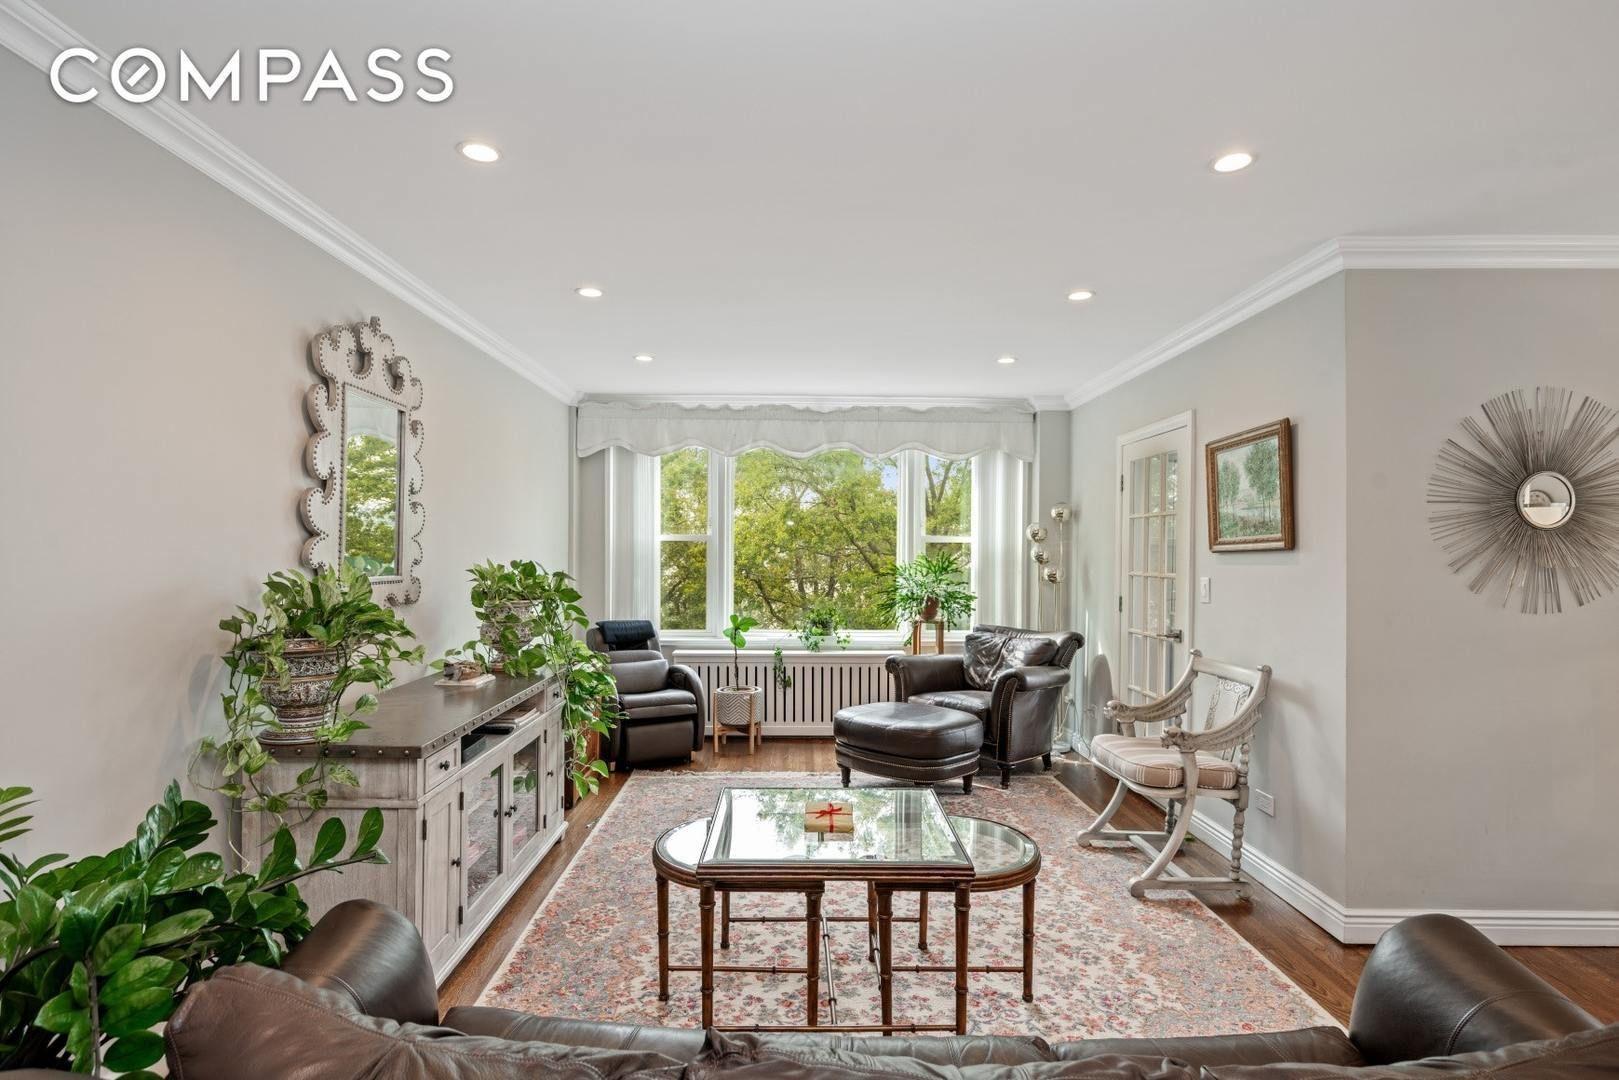 Apartment for sale at 9201 Shore Road, Apt B-402